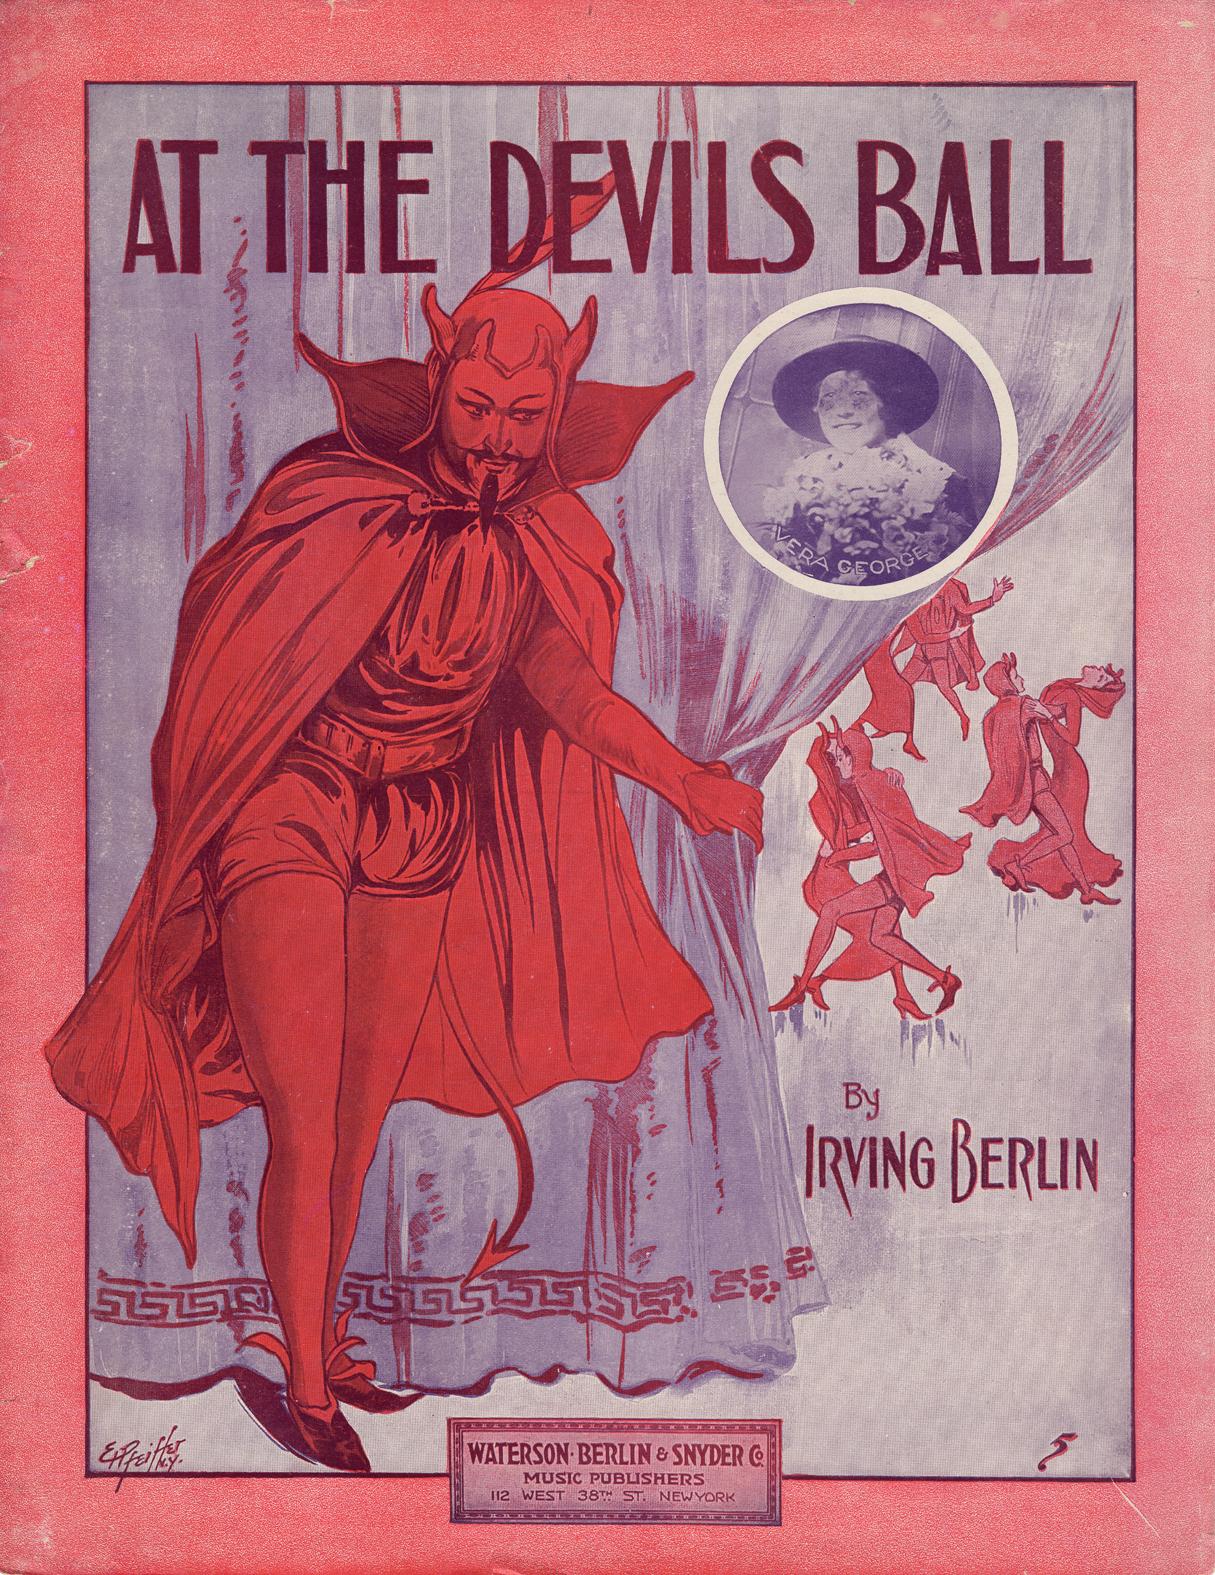 Castle Ragtime Devils Ball - Gifts for Mystics